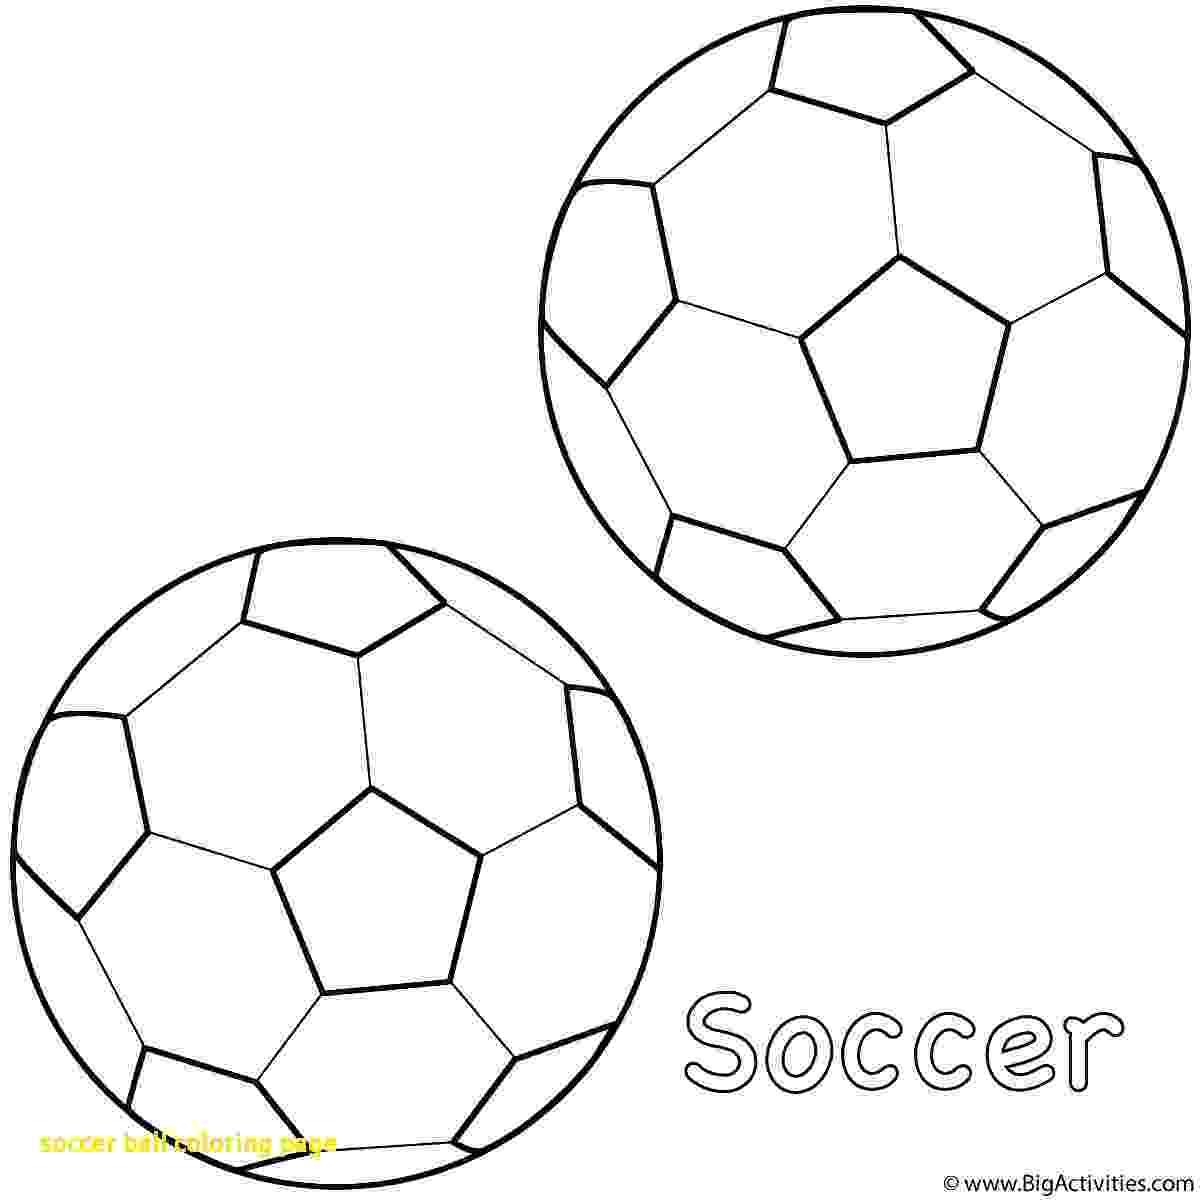 soccer ball coloring book soccer ball coloring pages printable argentina soccer ball soccer book coloring